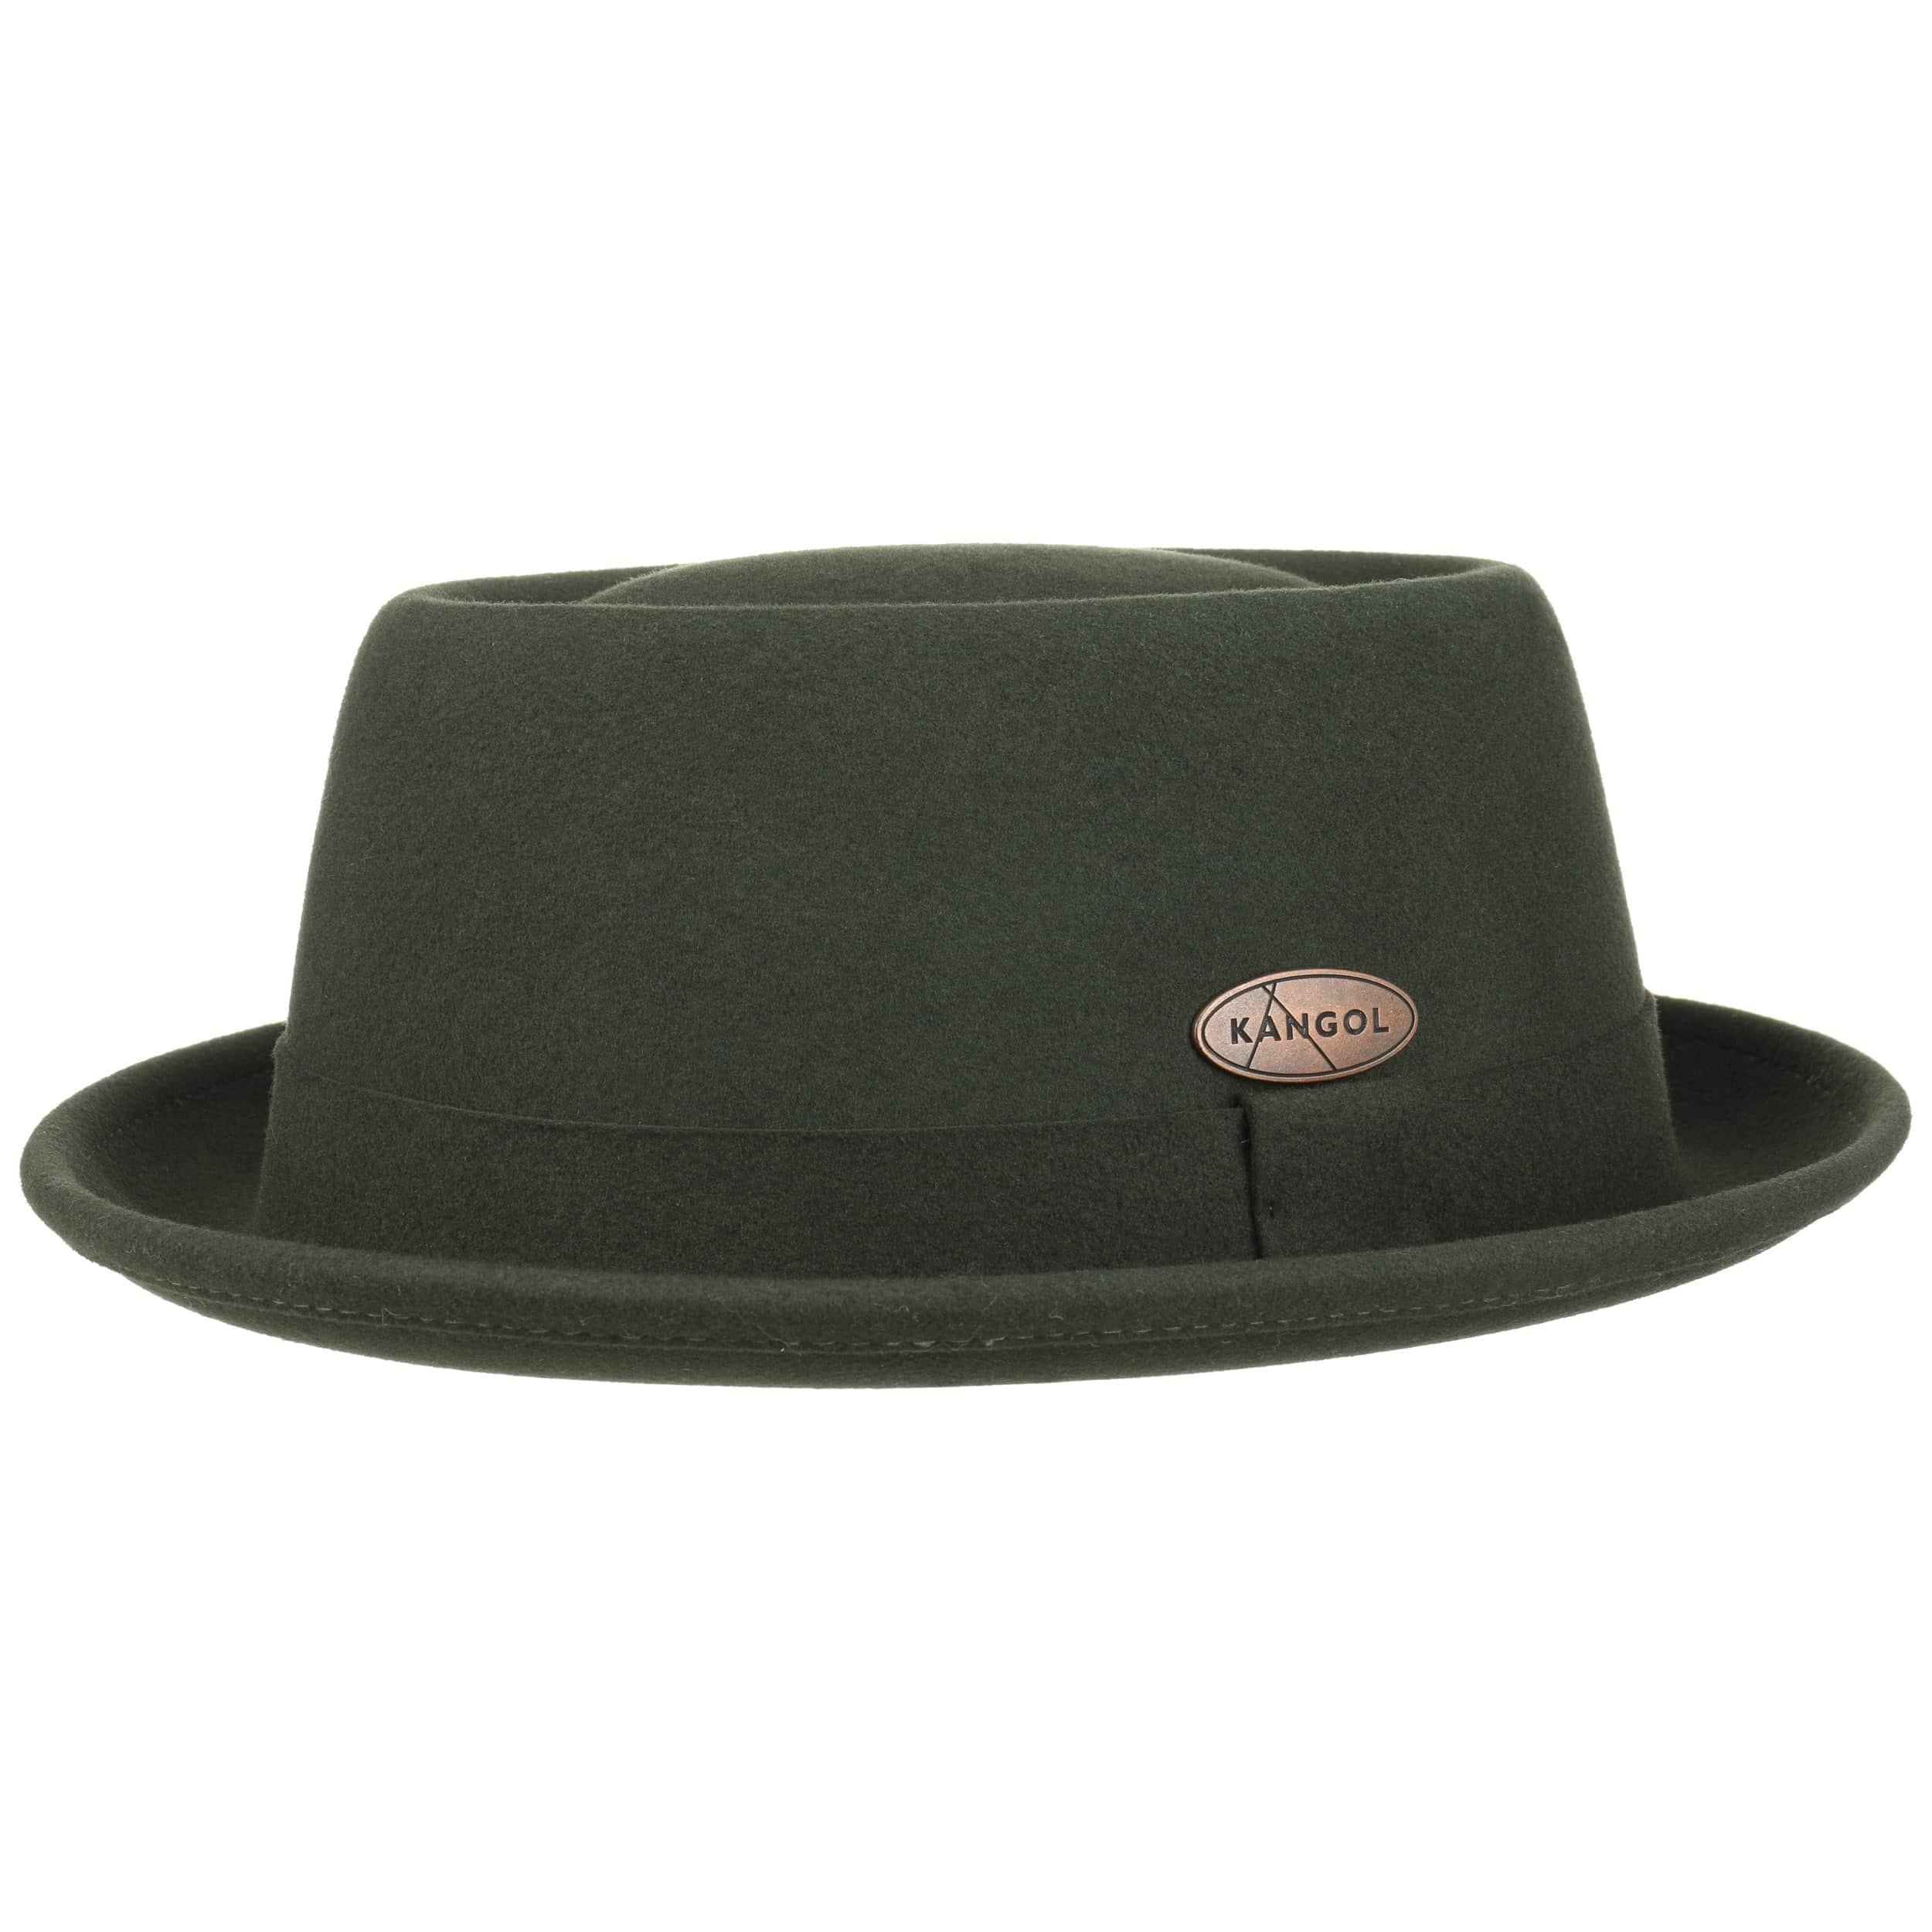 0e8331abd3d90 Sombrero Lite Felt Pork Pie by Kangol - Sombreros - sombreroshop.es